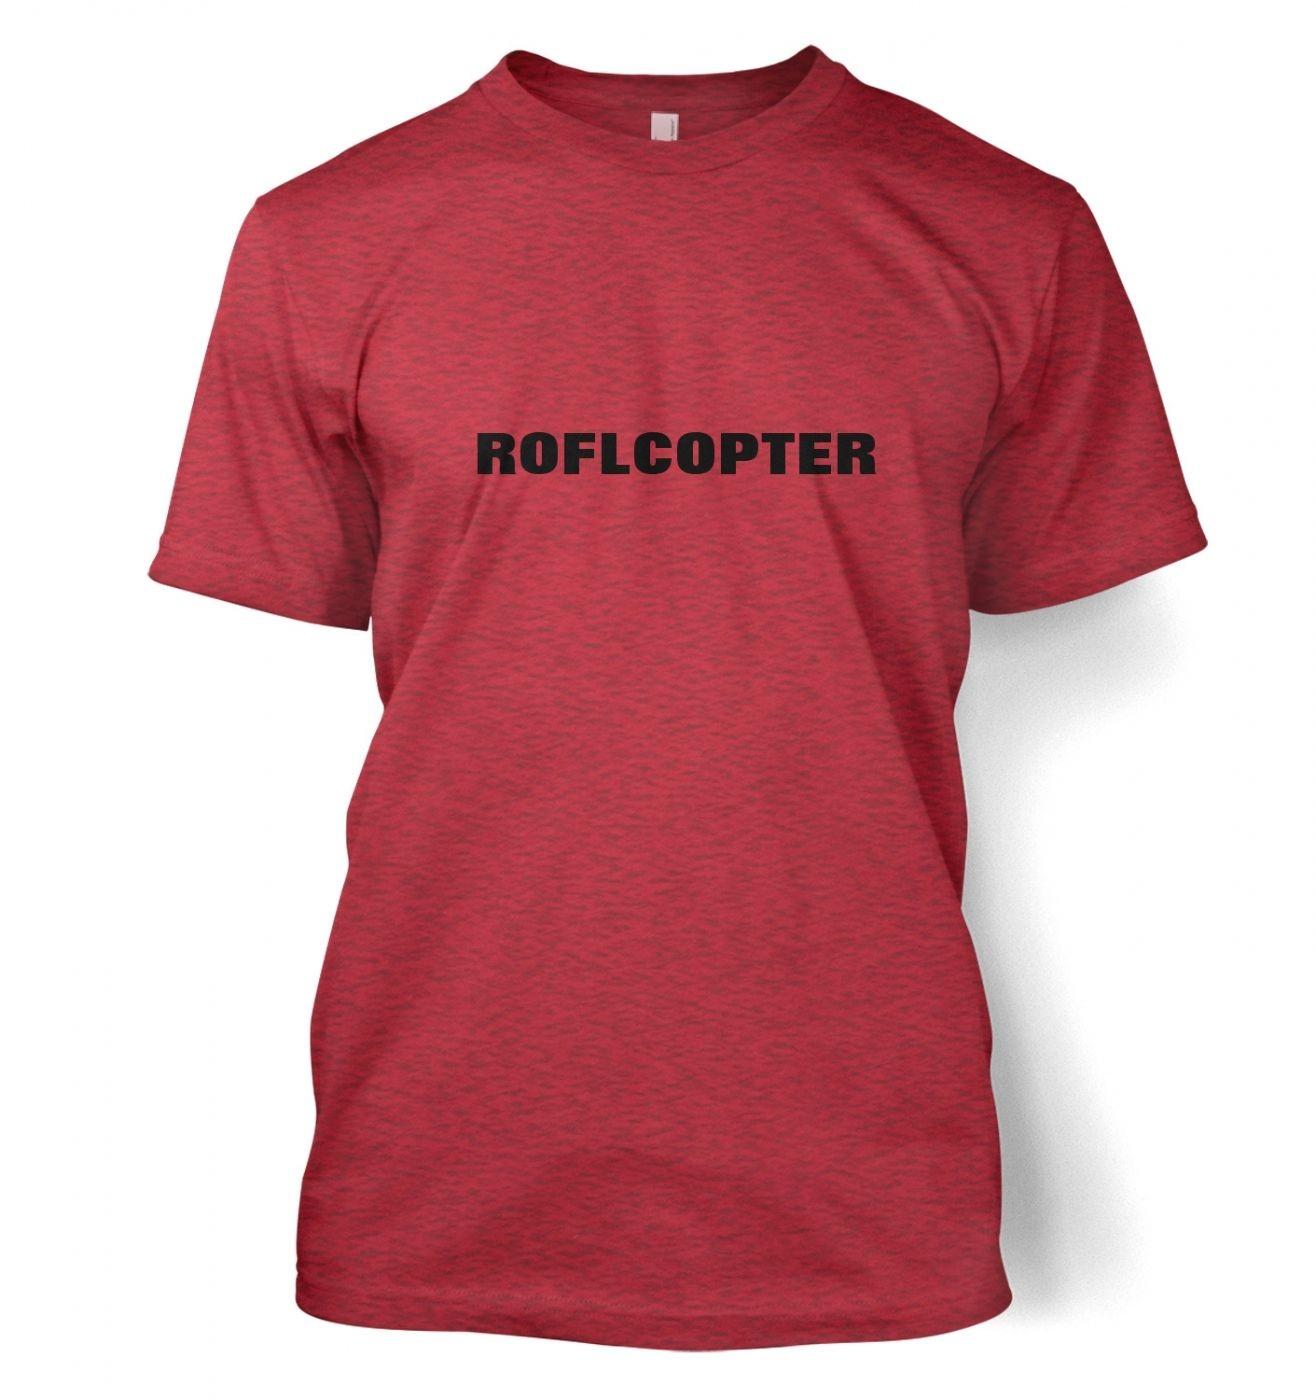 ROFLCOPTER Men's t-shirt